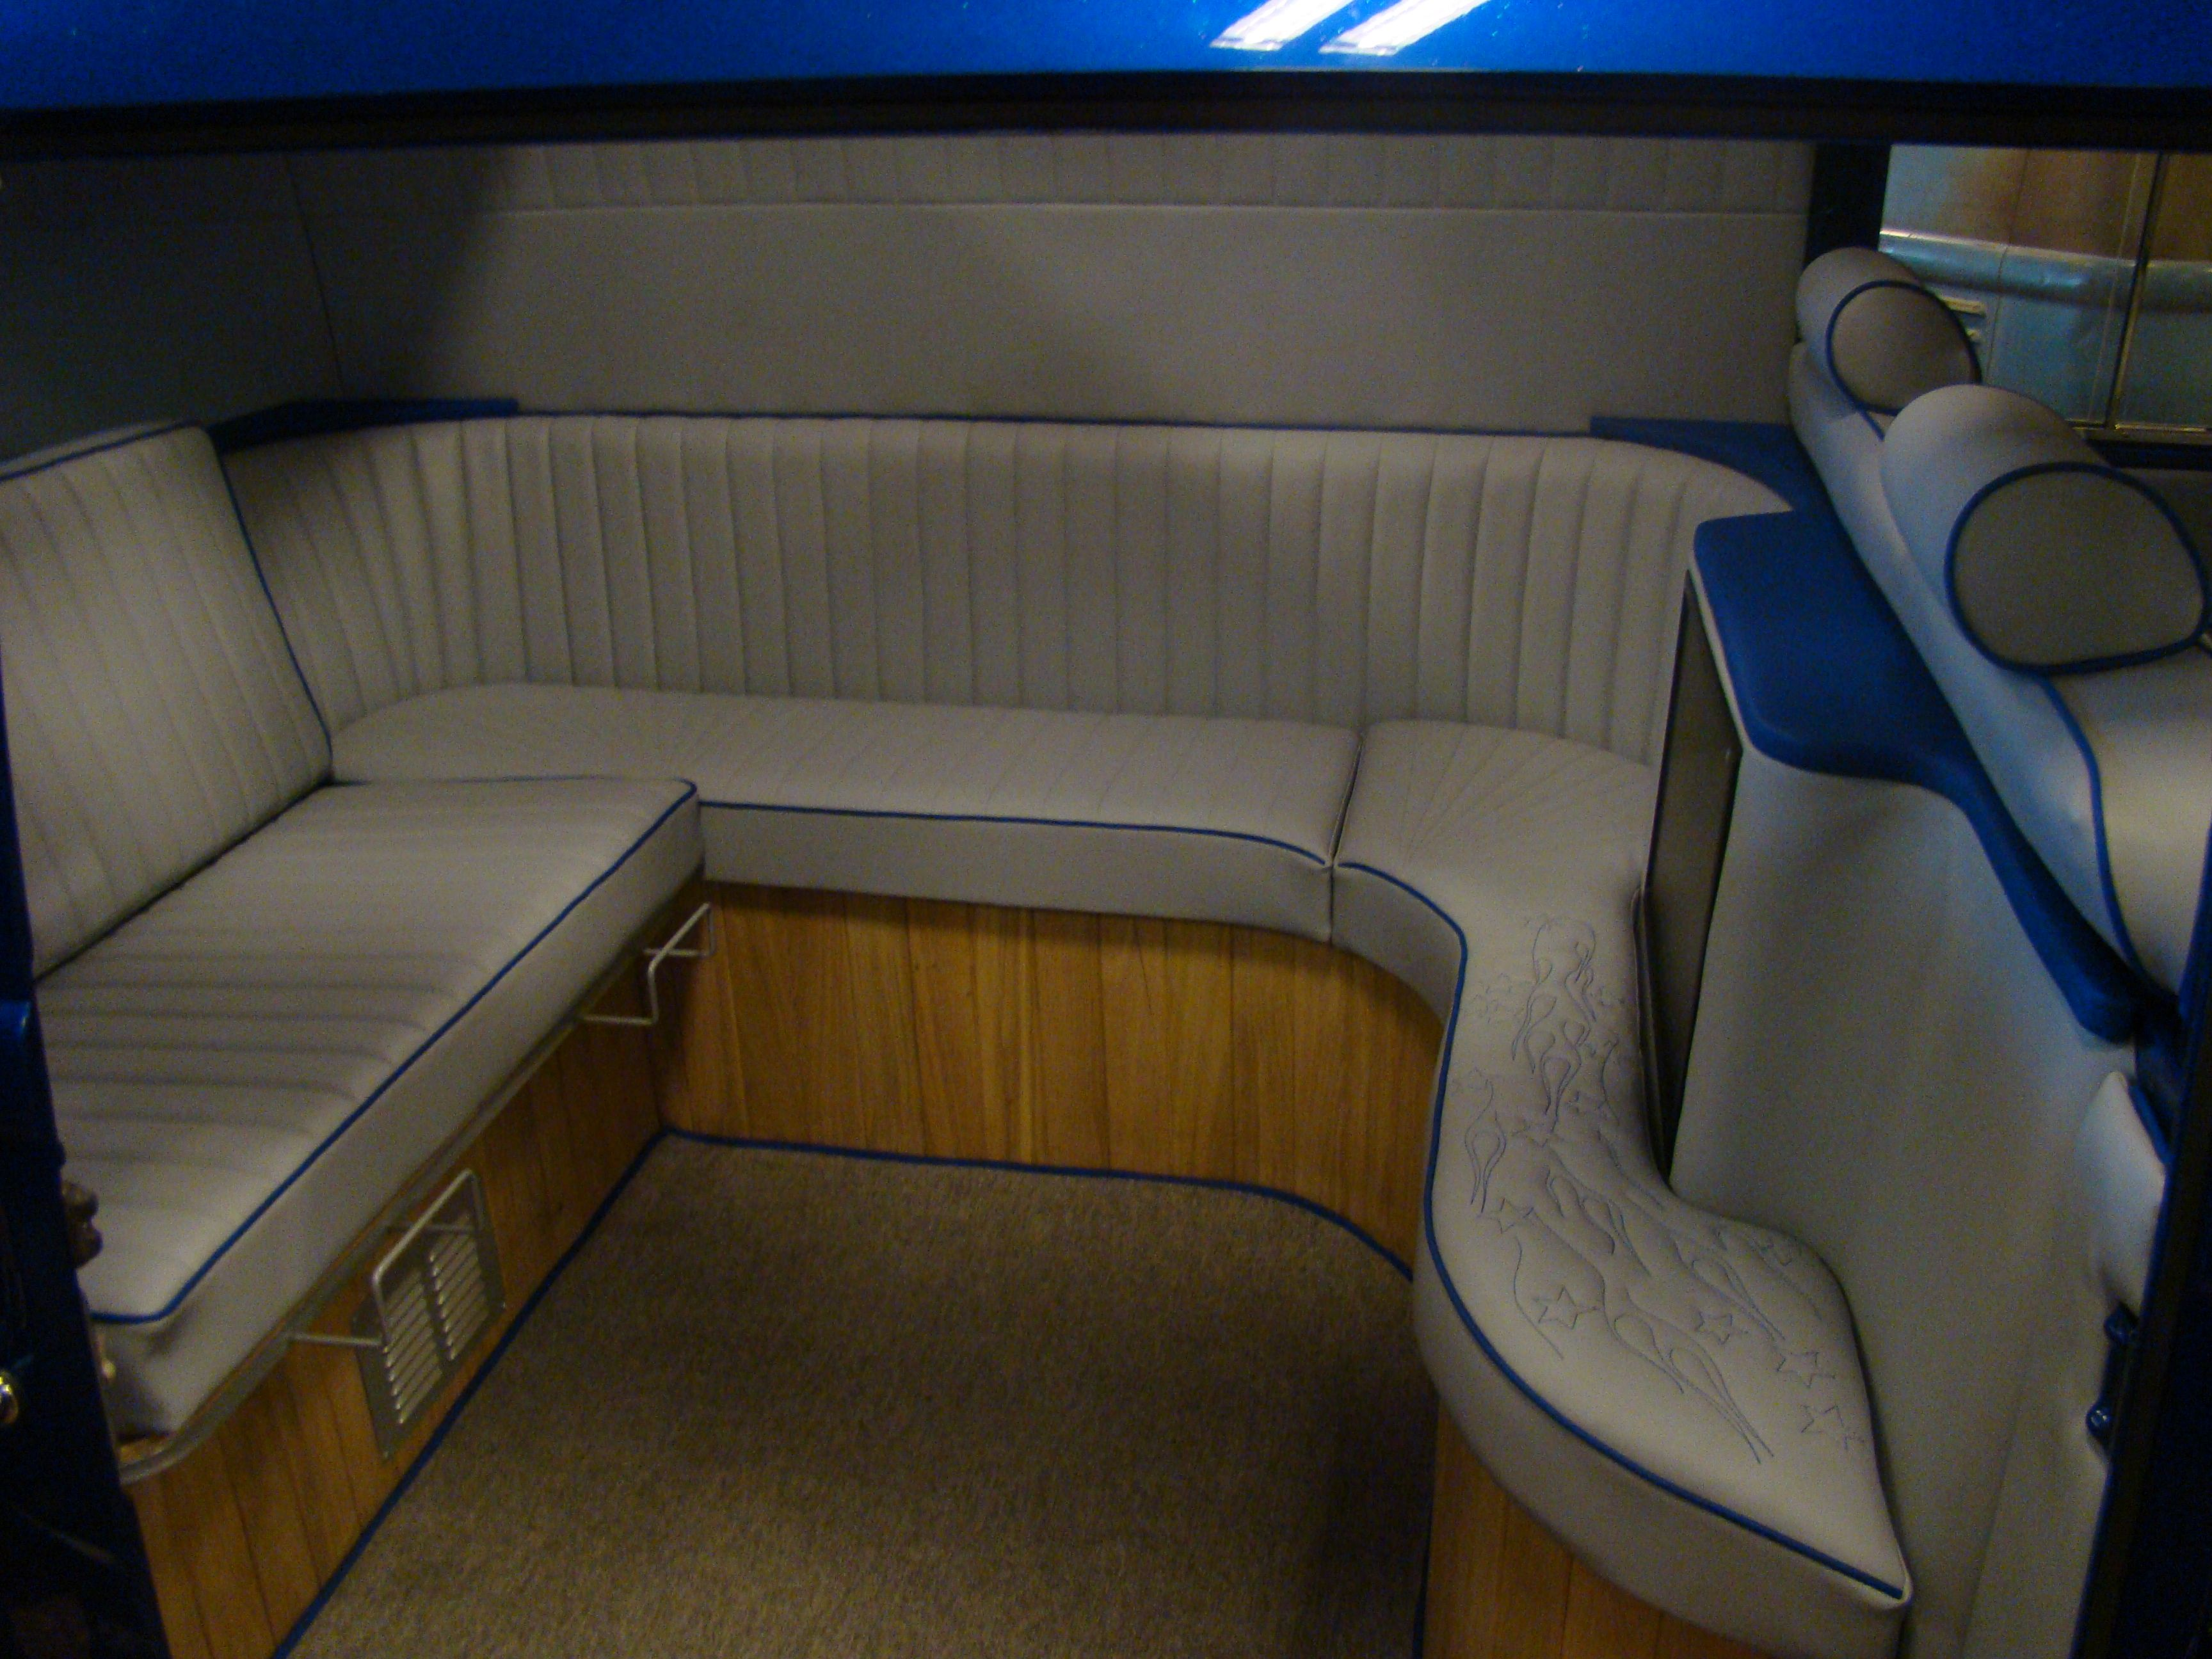 Vw camper interior vw interior ideas pinterest for Vw camper van interior designs